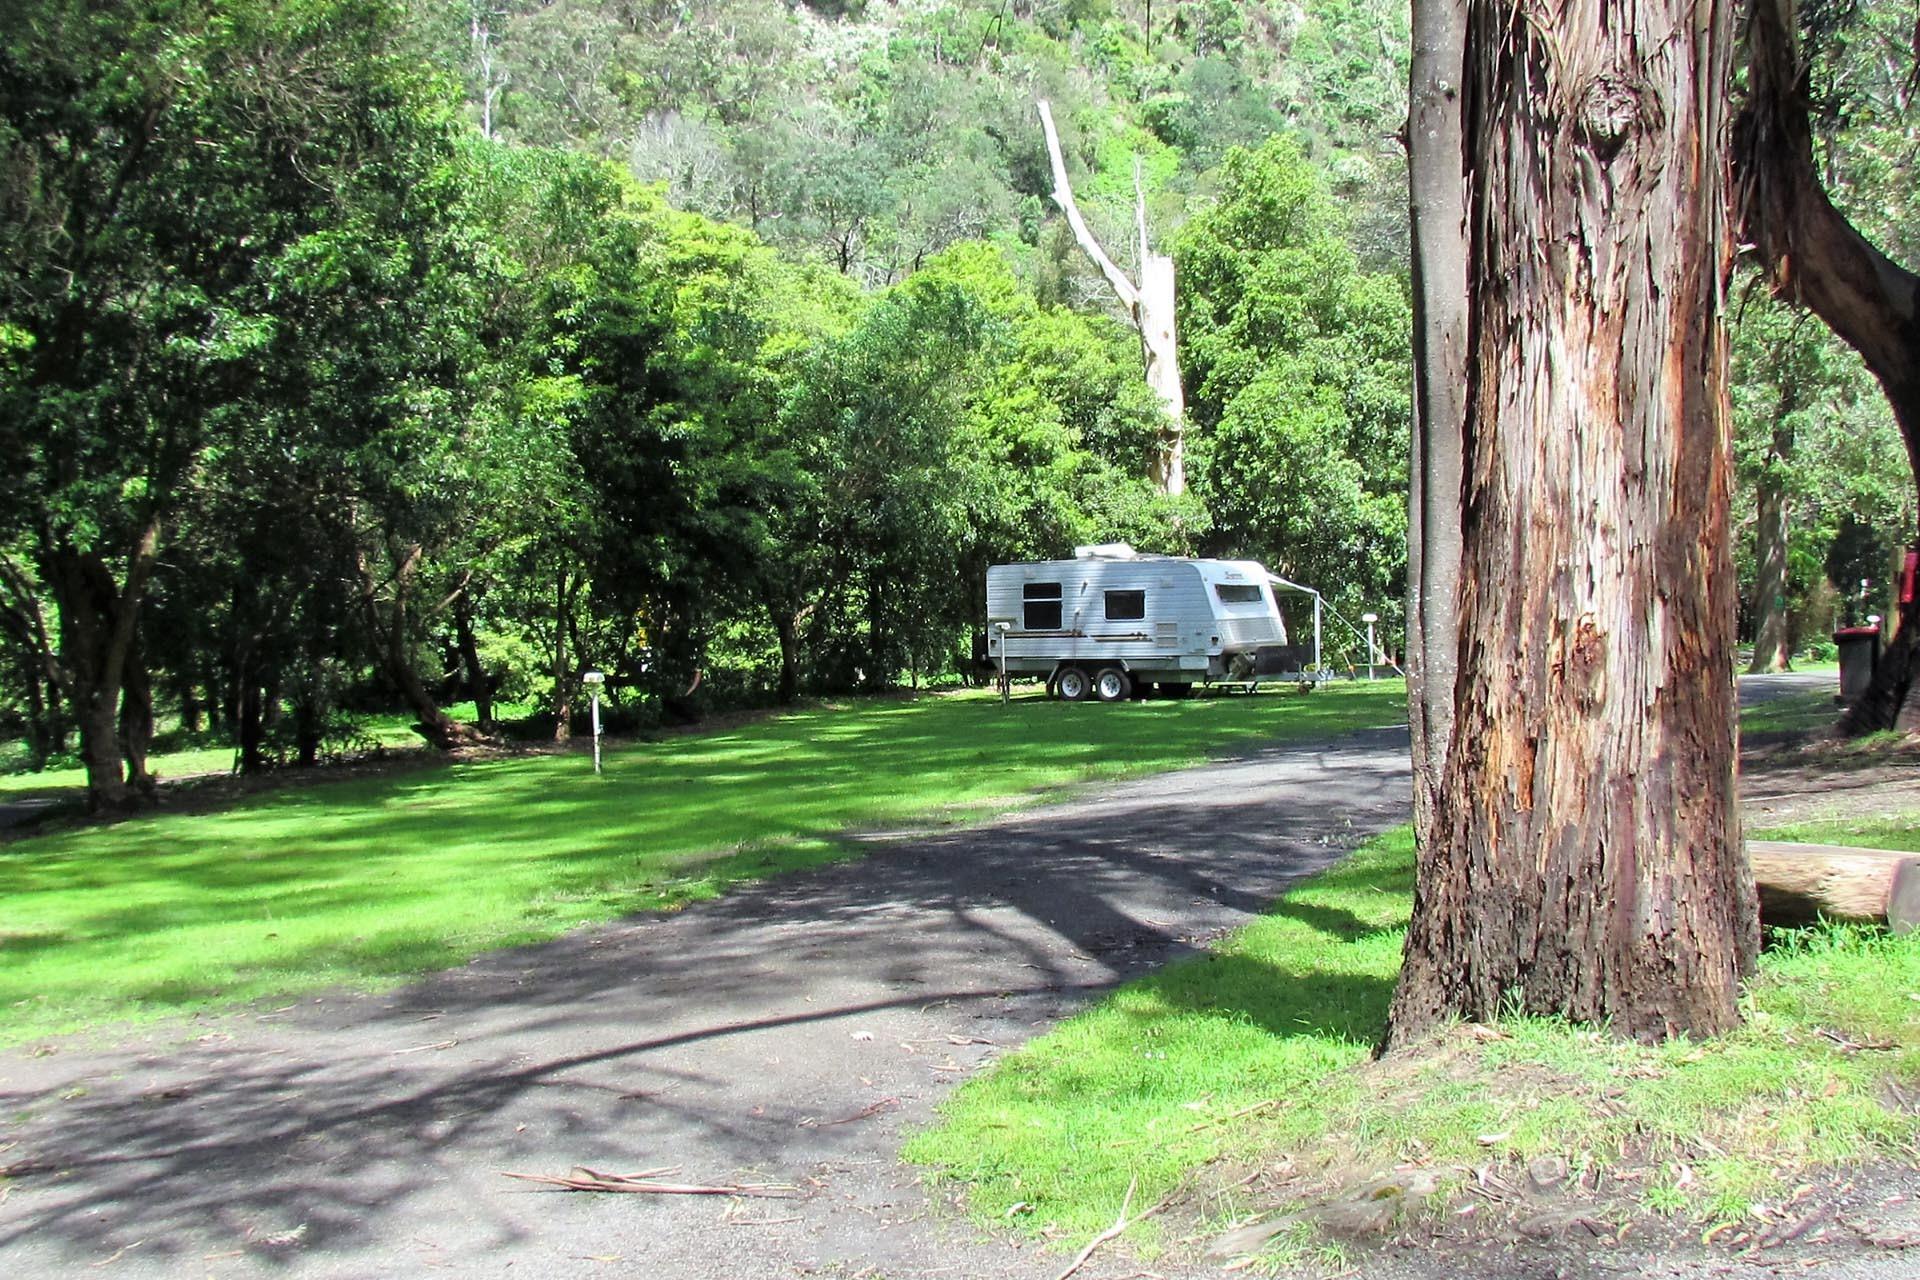 a - Tarra Valley Caravan Park